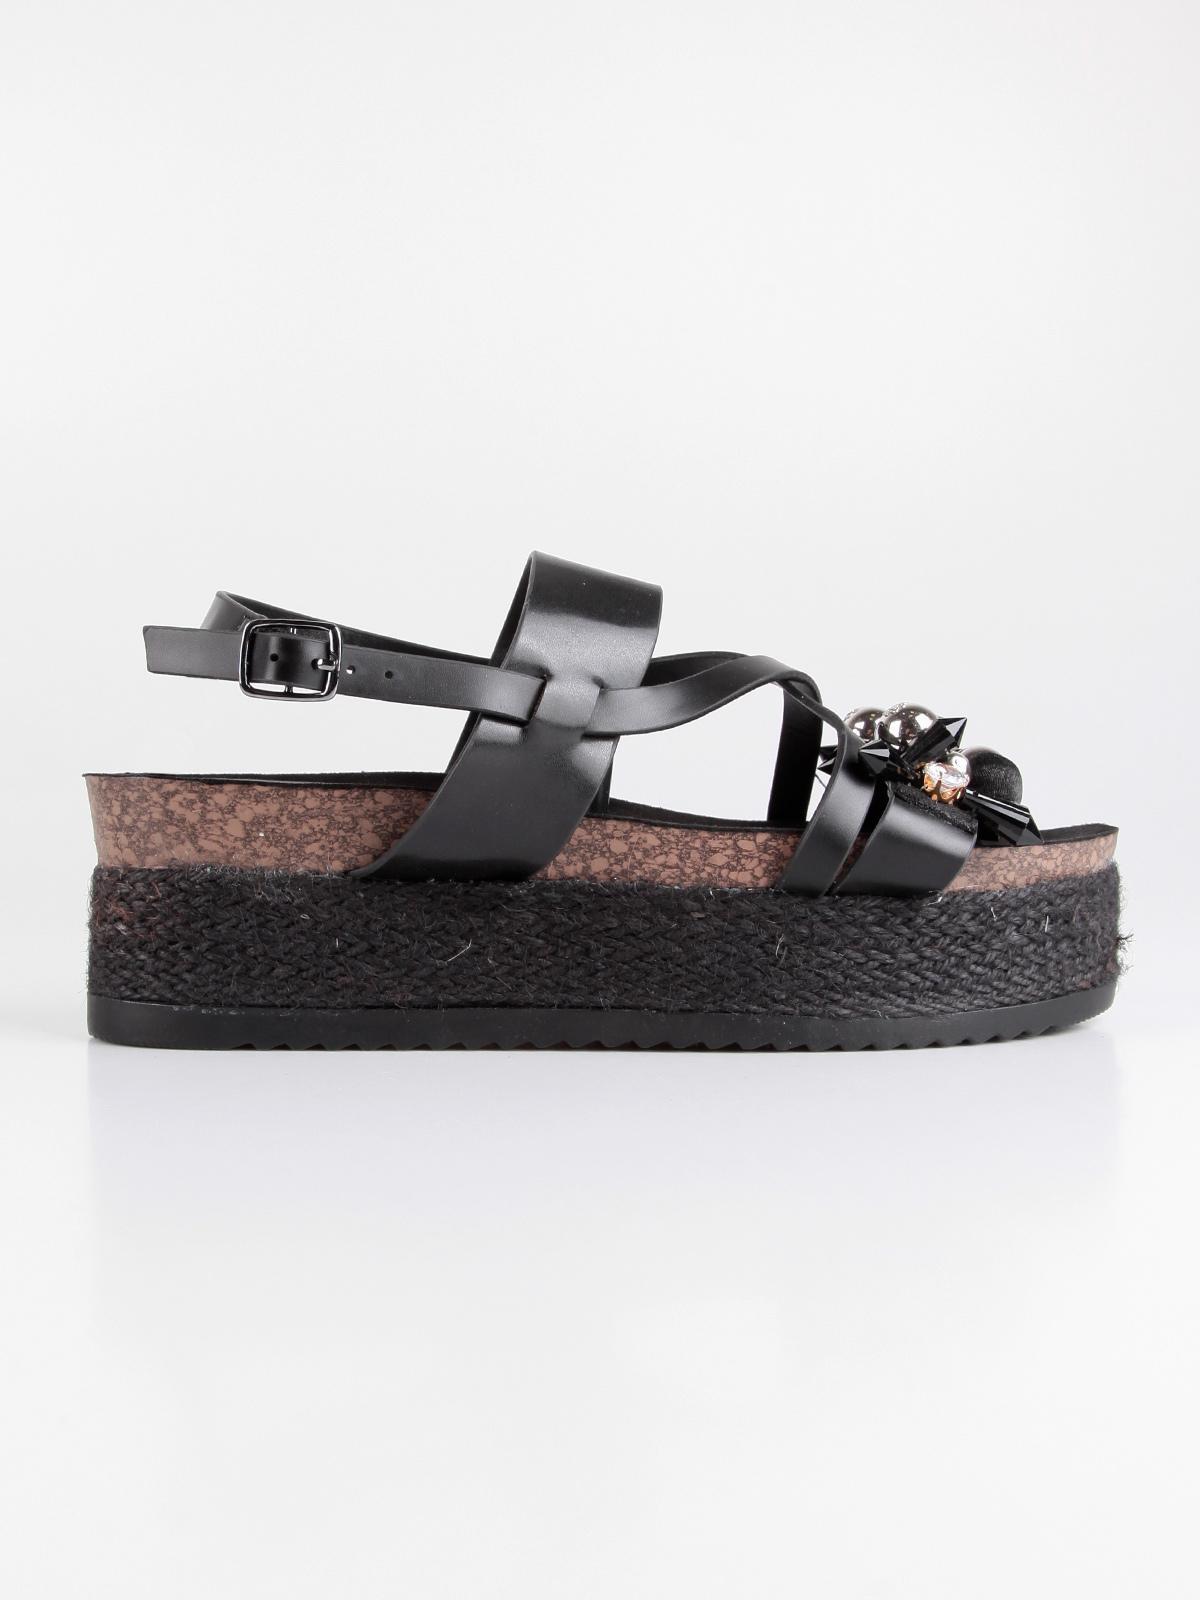 bc708c3130 Sandali platform neri con borchie e strass onyx   MecShopping